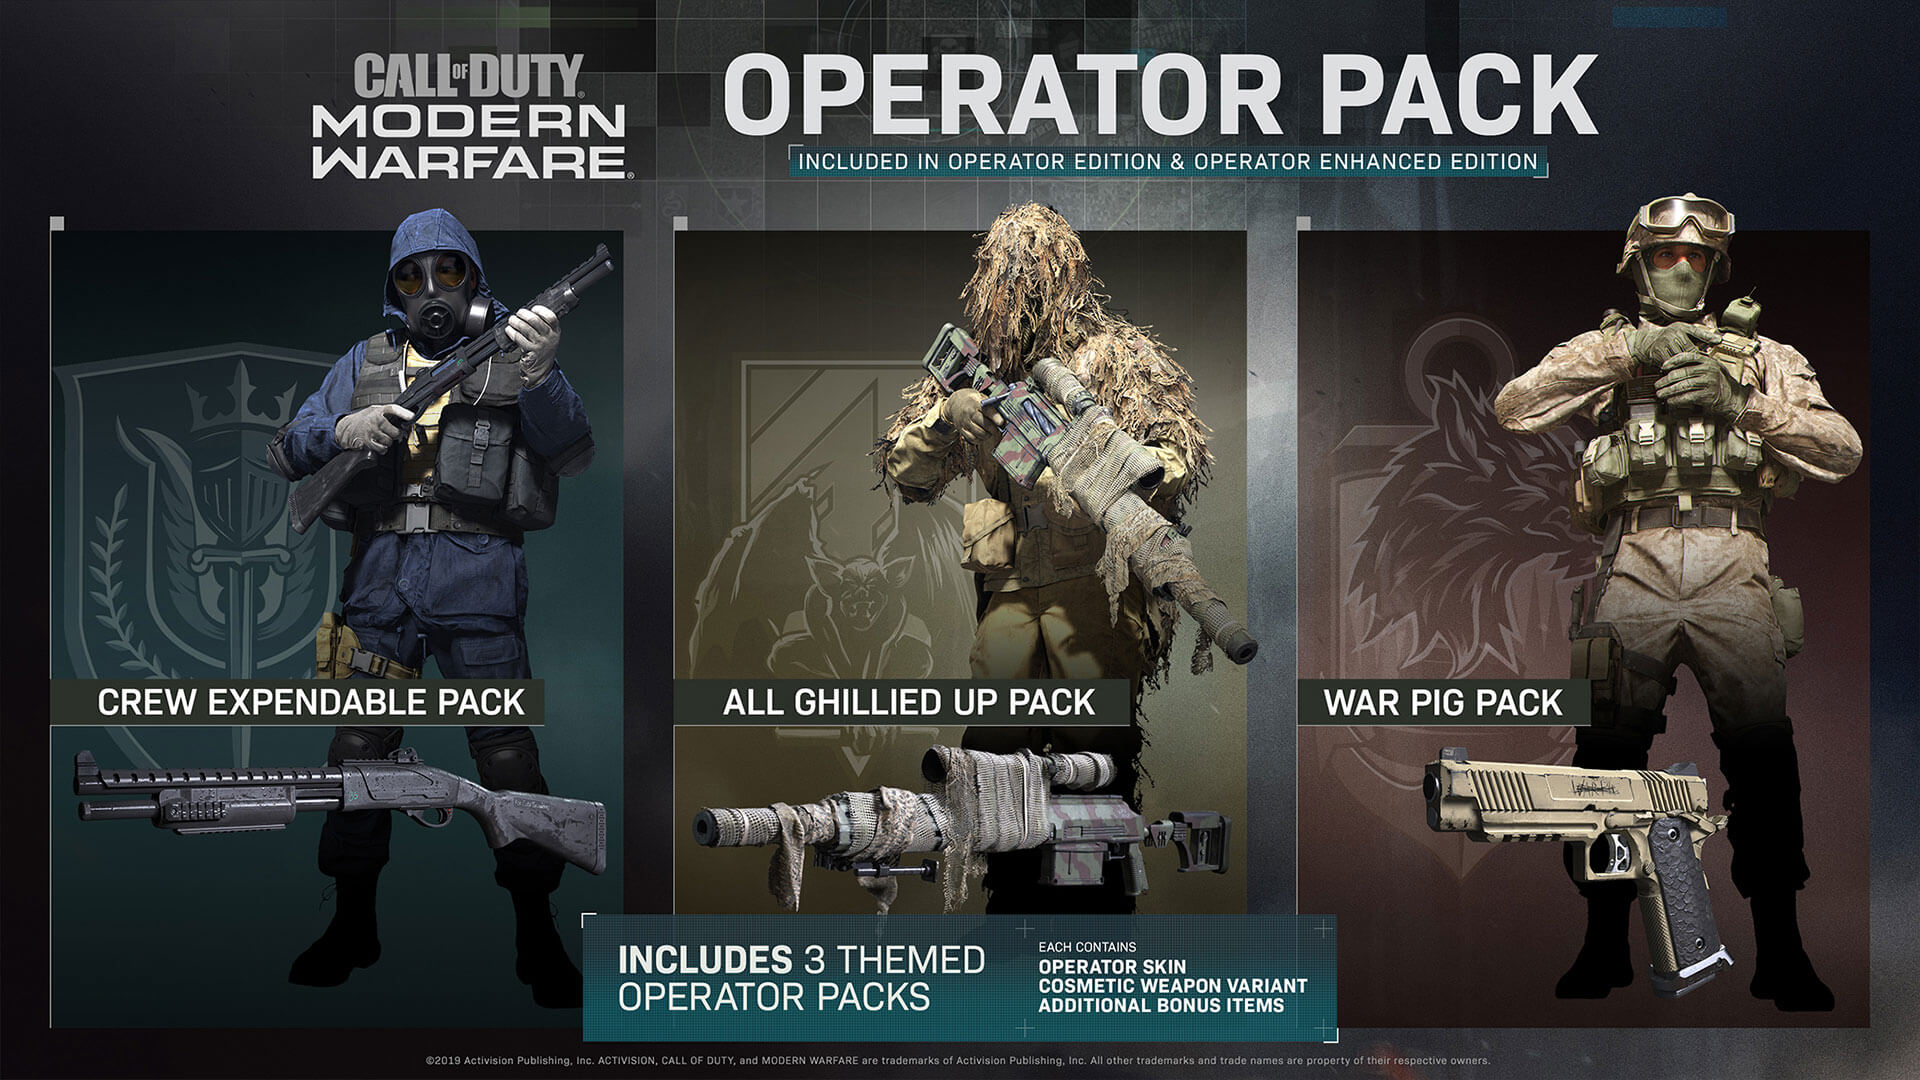 Call of Duty: Modern Warfare オペレーターパック